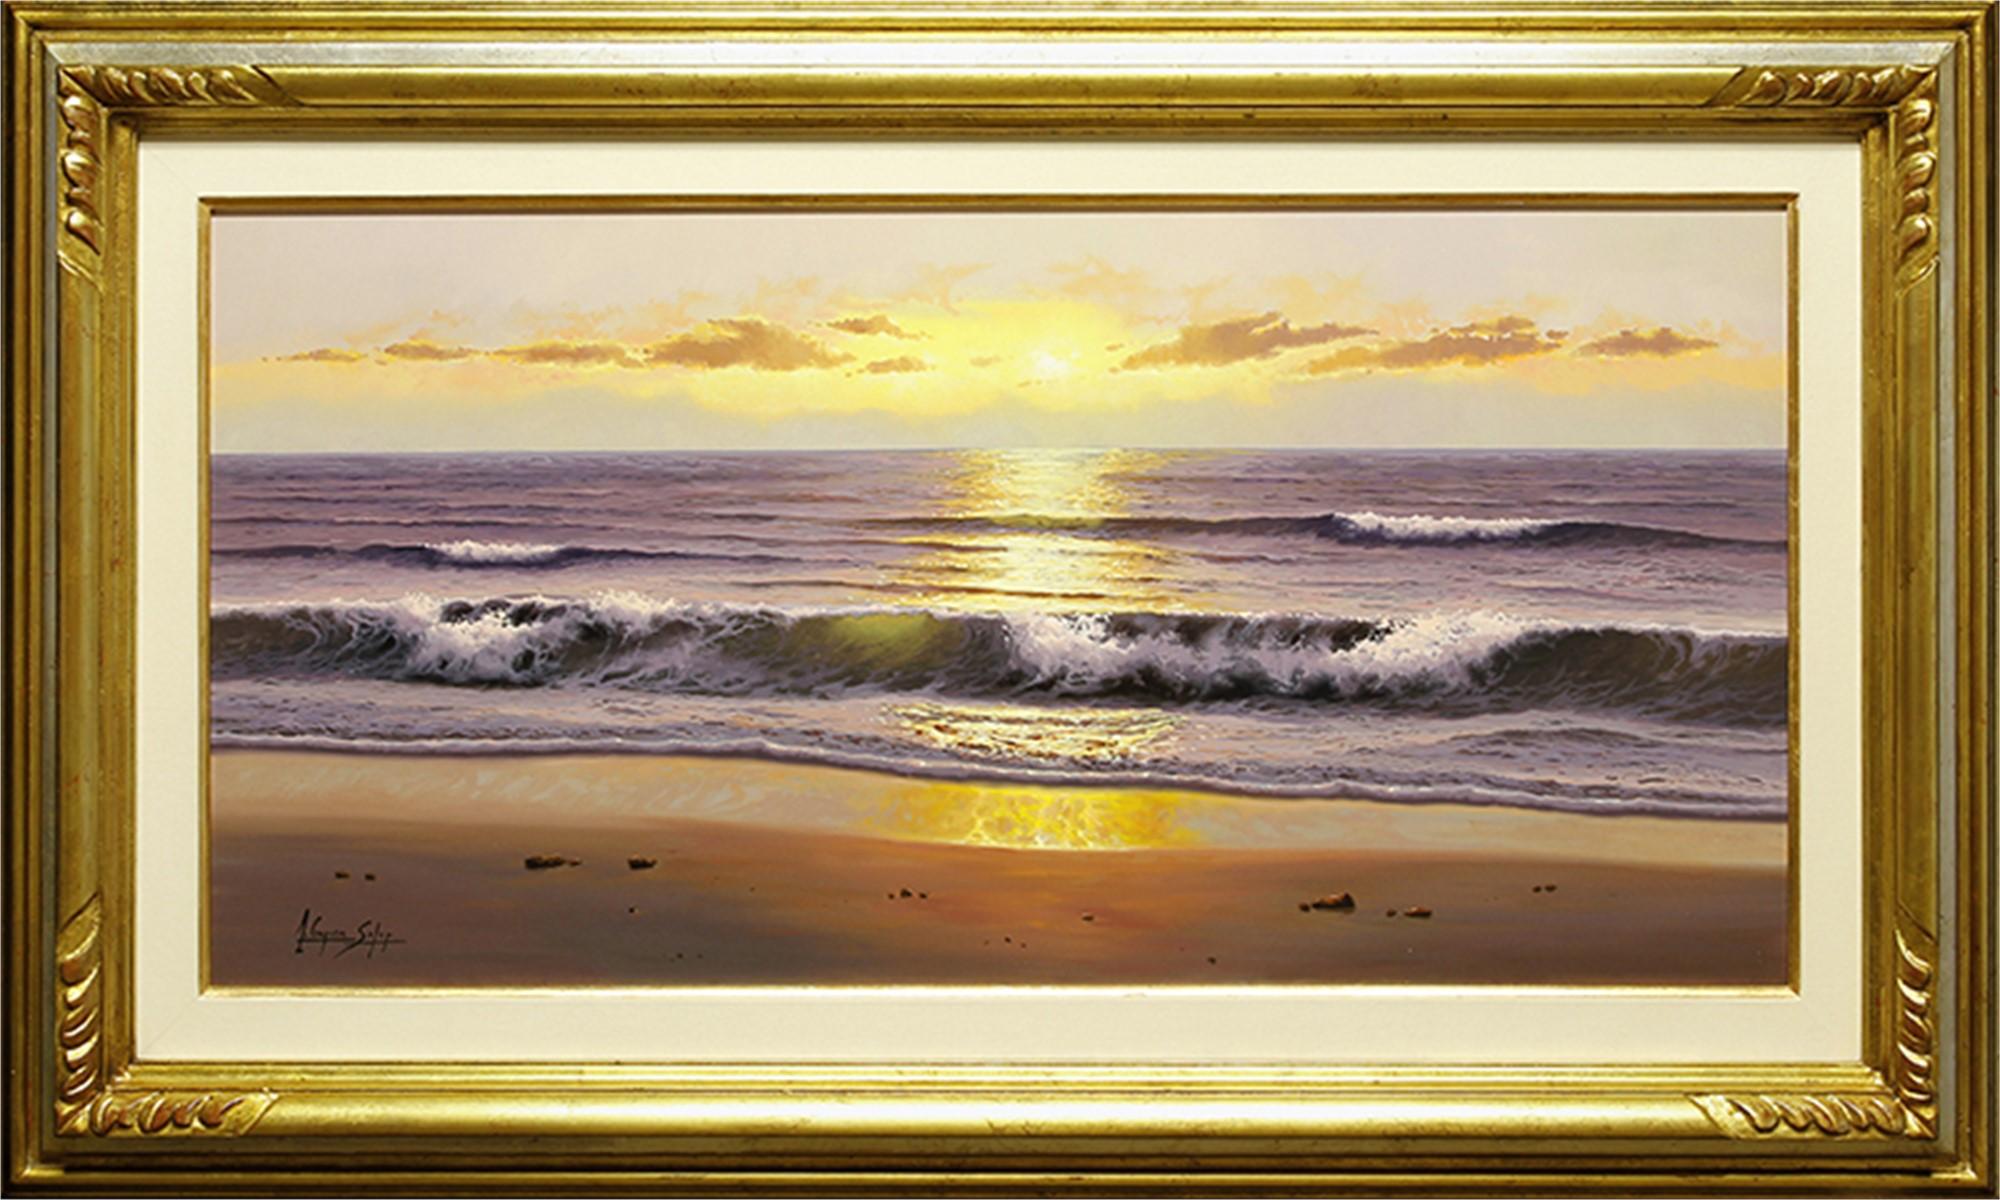 Sunset Surprise by Antonio Soler